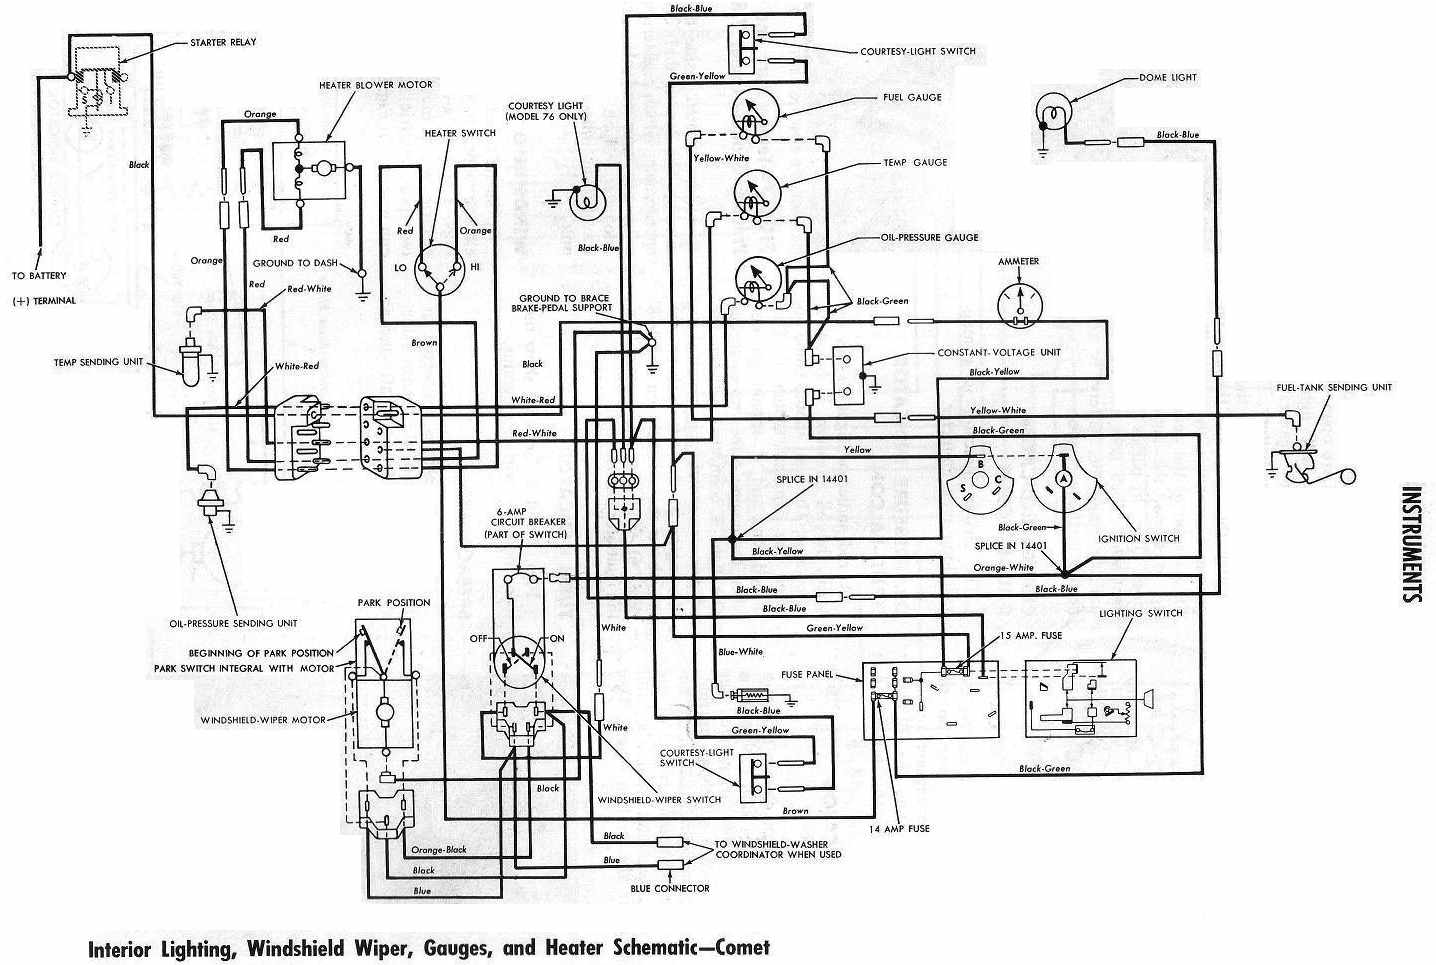 wiring diagram ford falcon au radio with 65  Et Wiring Diagram on Ford Xy Falcon Wiring Diagram Wiring Diagrams further Car Radio Wiring Diagram Pdf besides 507443 1963 Ranchero Wiring Diagram Anyone Got One together with Mach 460 Wiring Diagram as well 1964 Ford Falcon Wiper Switch Wiring Diagram.